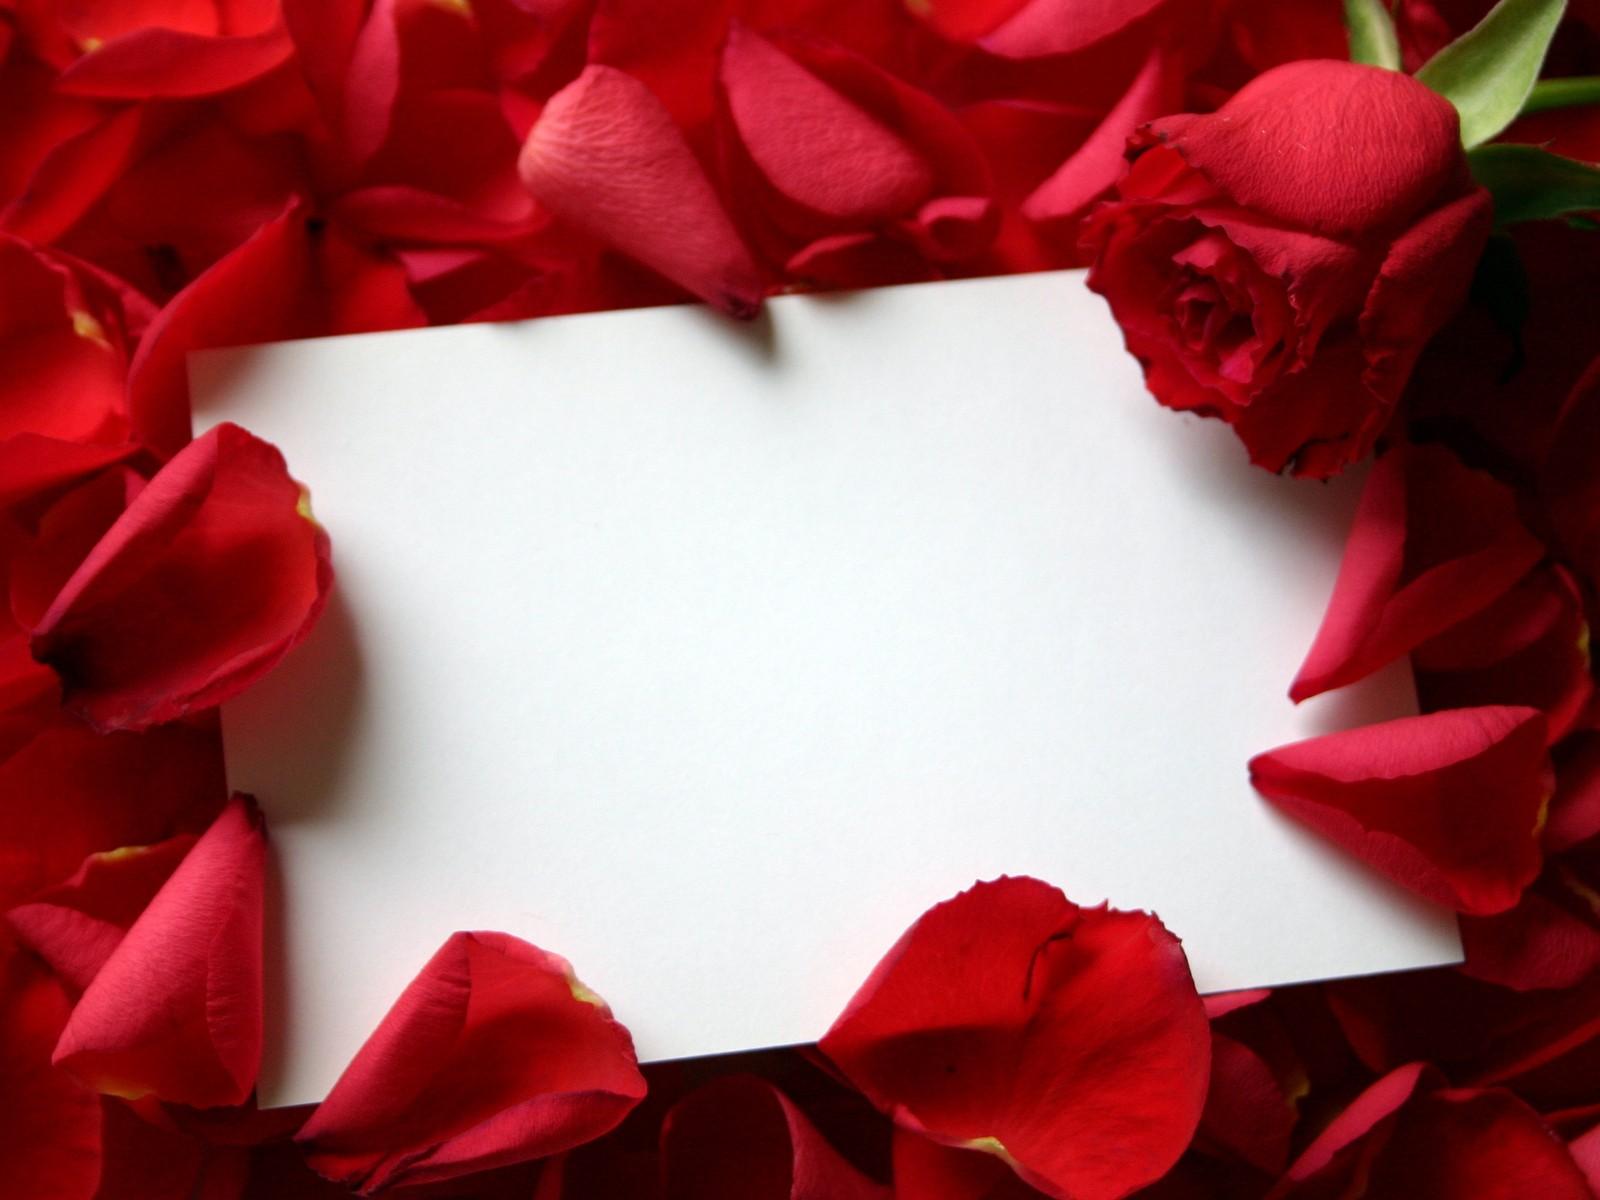 http://4.bp.blogspot.com/-2wawyJAp3CA/TtPob_MTAPI/AAAAAAAAAIE/EoGs2IBhcGI/s1600/roses_and_letter_desktop_wallpaper_35200.jpg